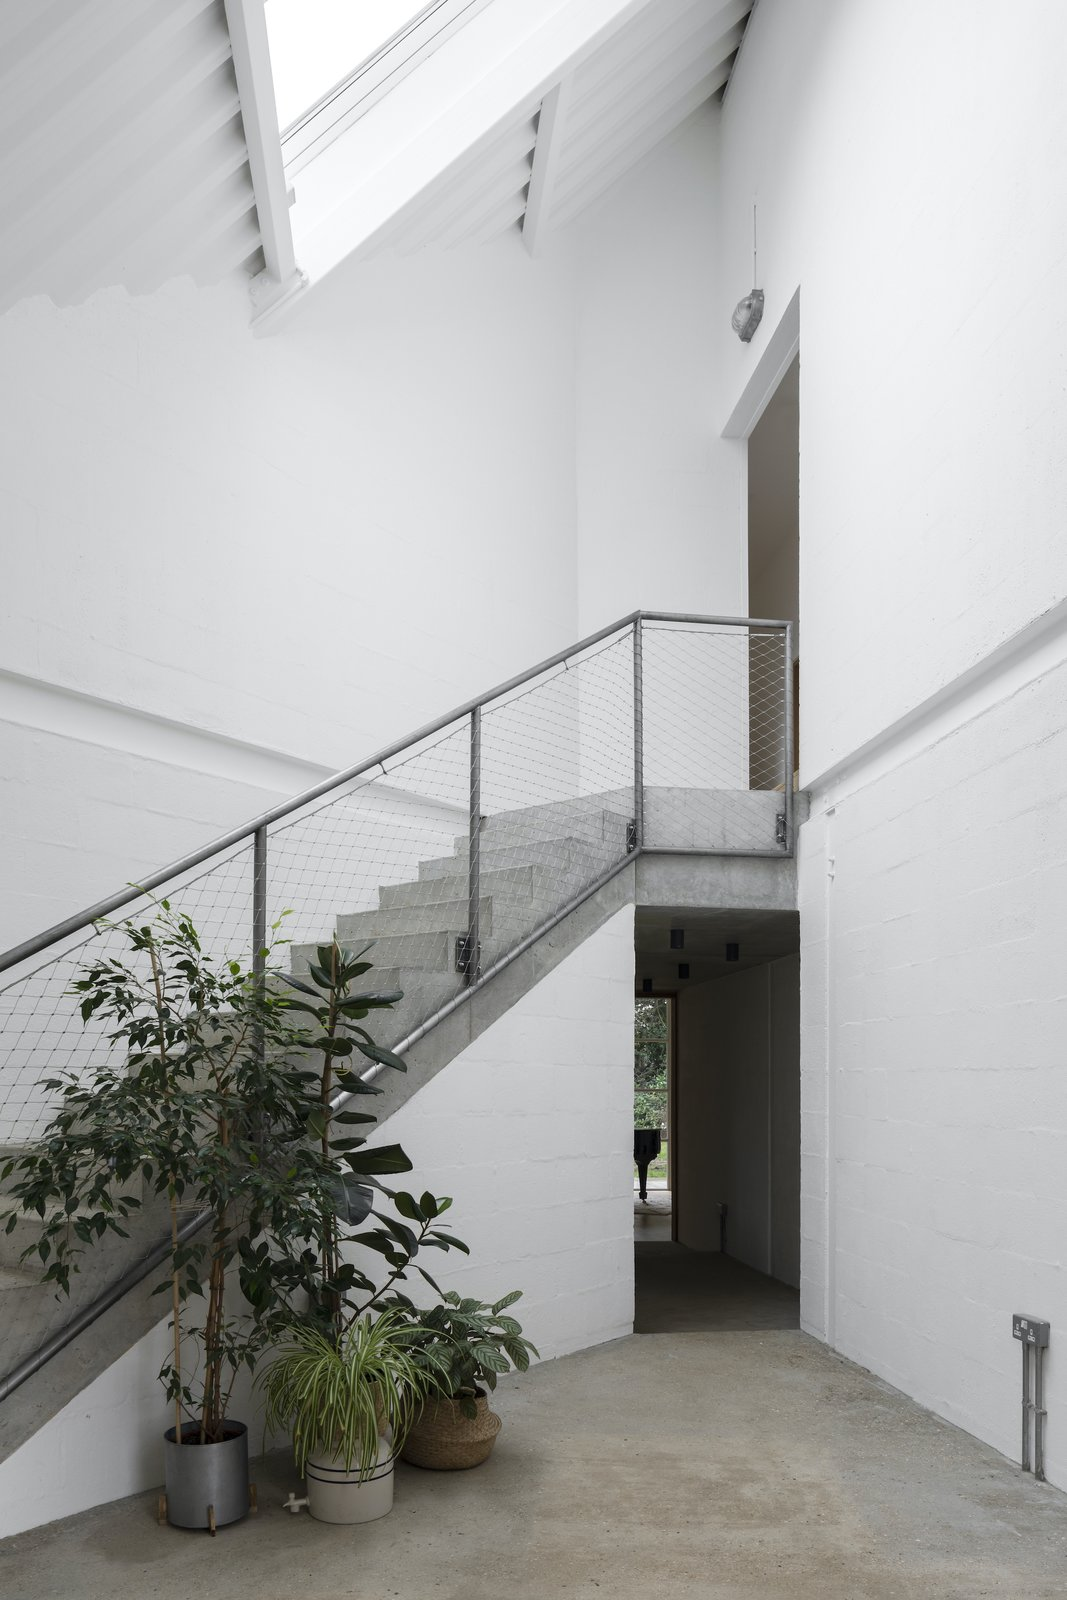 Ditton Hill House internal courtyard